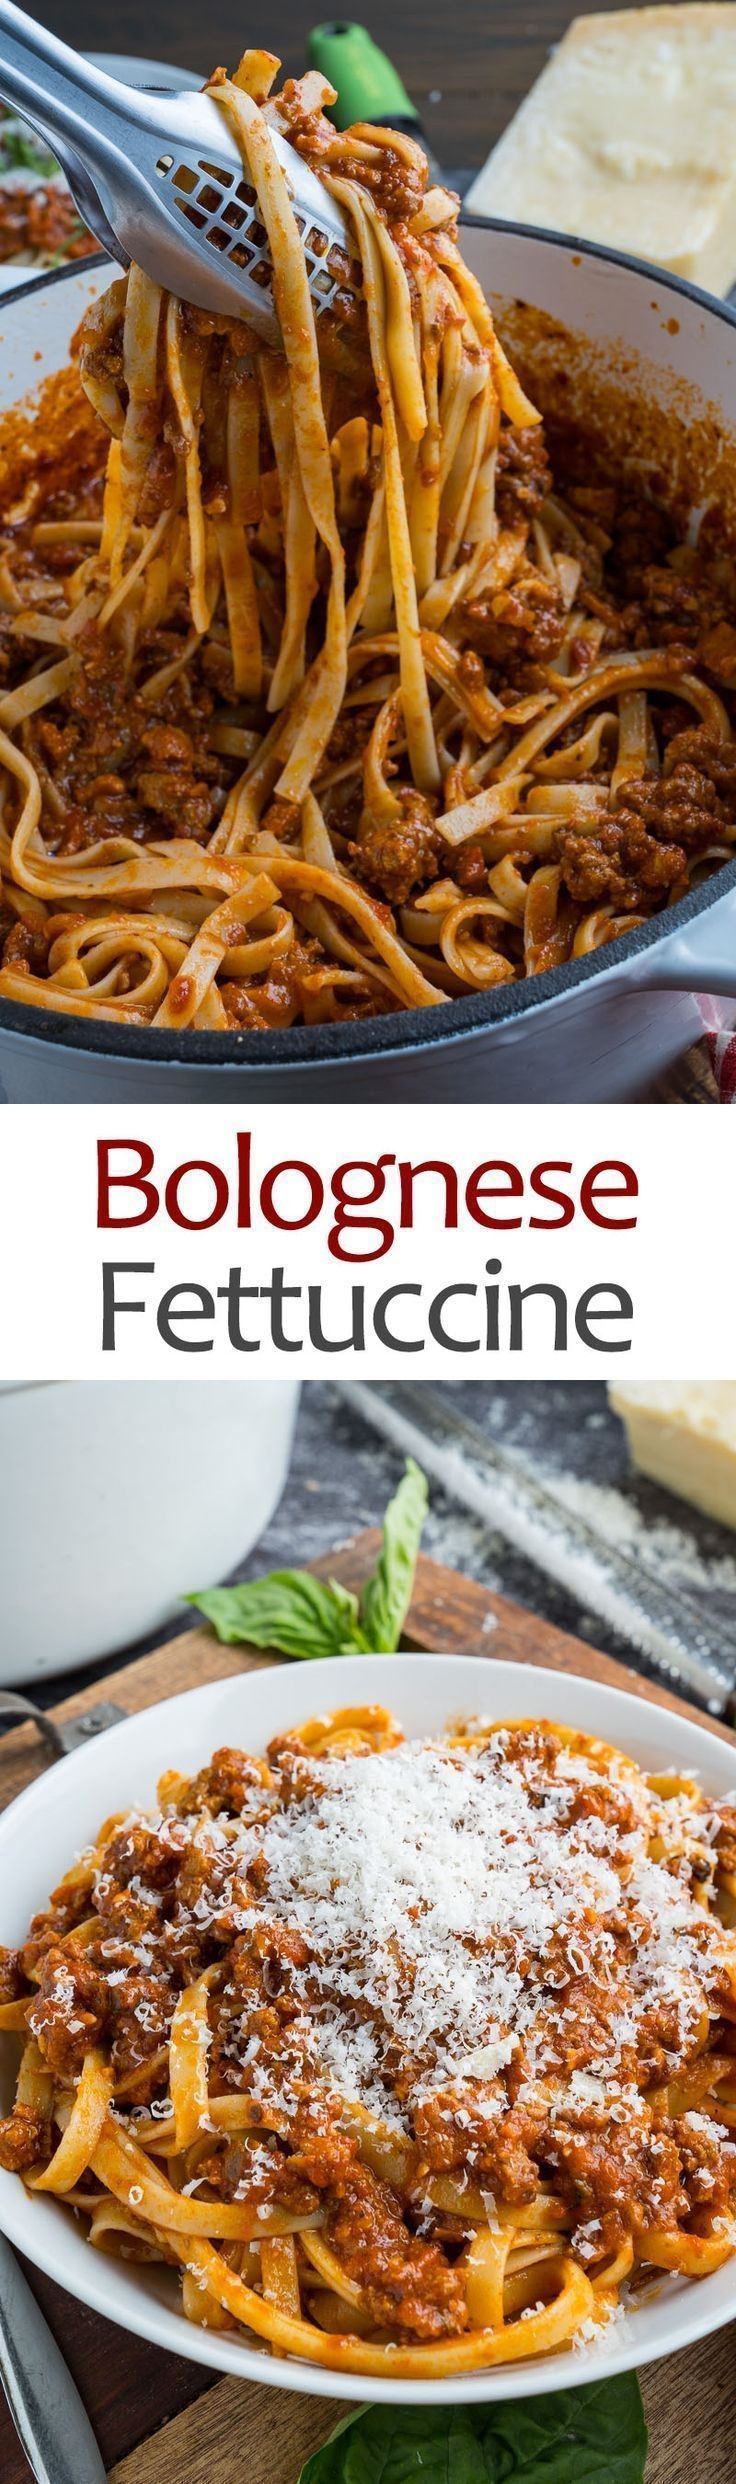 Bolognese Sauce #bolognesesauce Bolognese Sauce : Bolognese Sauce #Bolognese #Sauce #bolognesesauce Bolognese Sauce #bolognesesauce Bolognese Sauce : Bolognese Sauce #Bolognese #Sauce #bolognesesauce Bolognese Sauce #bolognesesauce Bolognese Sauce : Bolognese Sauce #Bolognese #Sauce #bolognesesauce Bolognese Sauce #bolognesesauce Bolognese Sauce : Bolognese Sauce #Bolognese #Sauce #bolognesesauce Bolognese Sauce #bolognesesauce Bolognese Sauce : Bolognese Sauce #Bolognese #Sauce #bolognesesauce #bolognesesauce